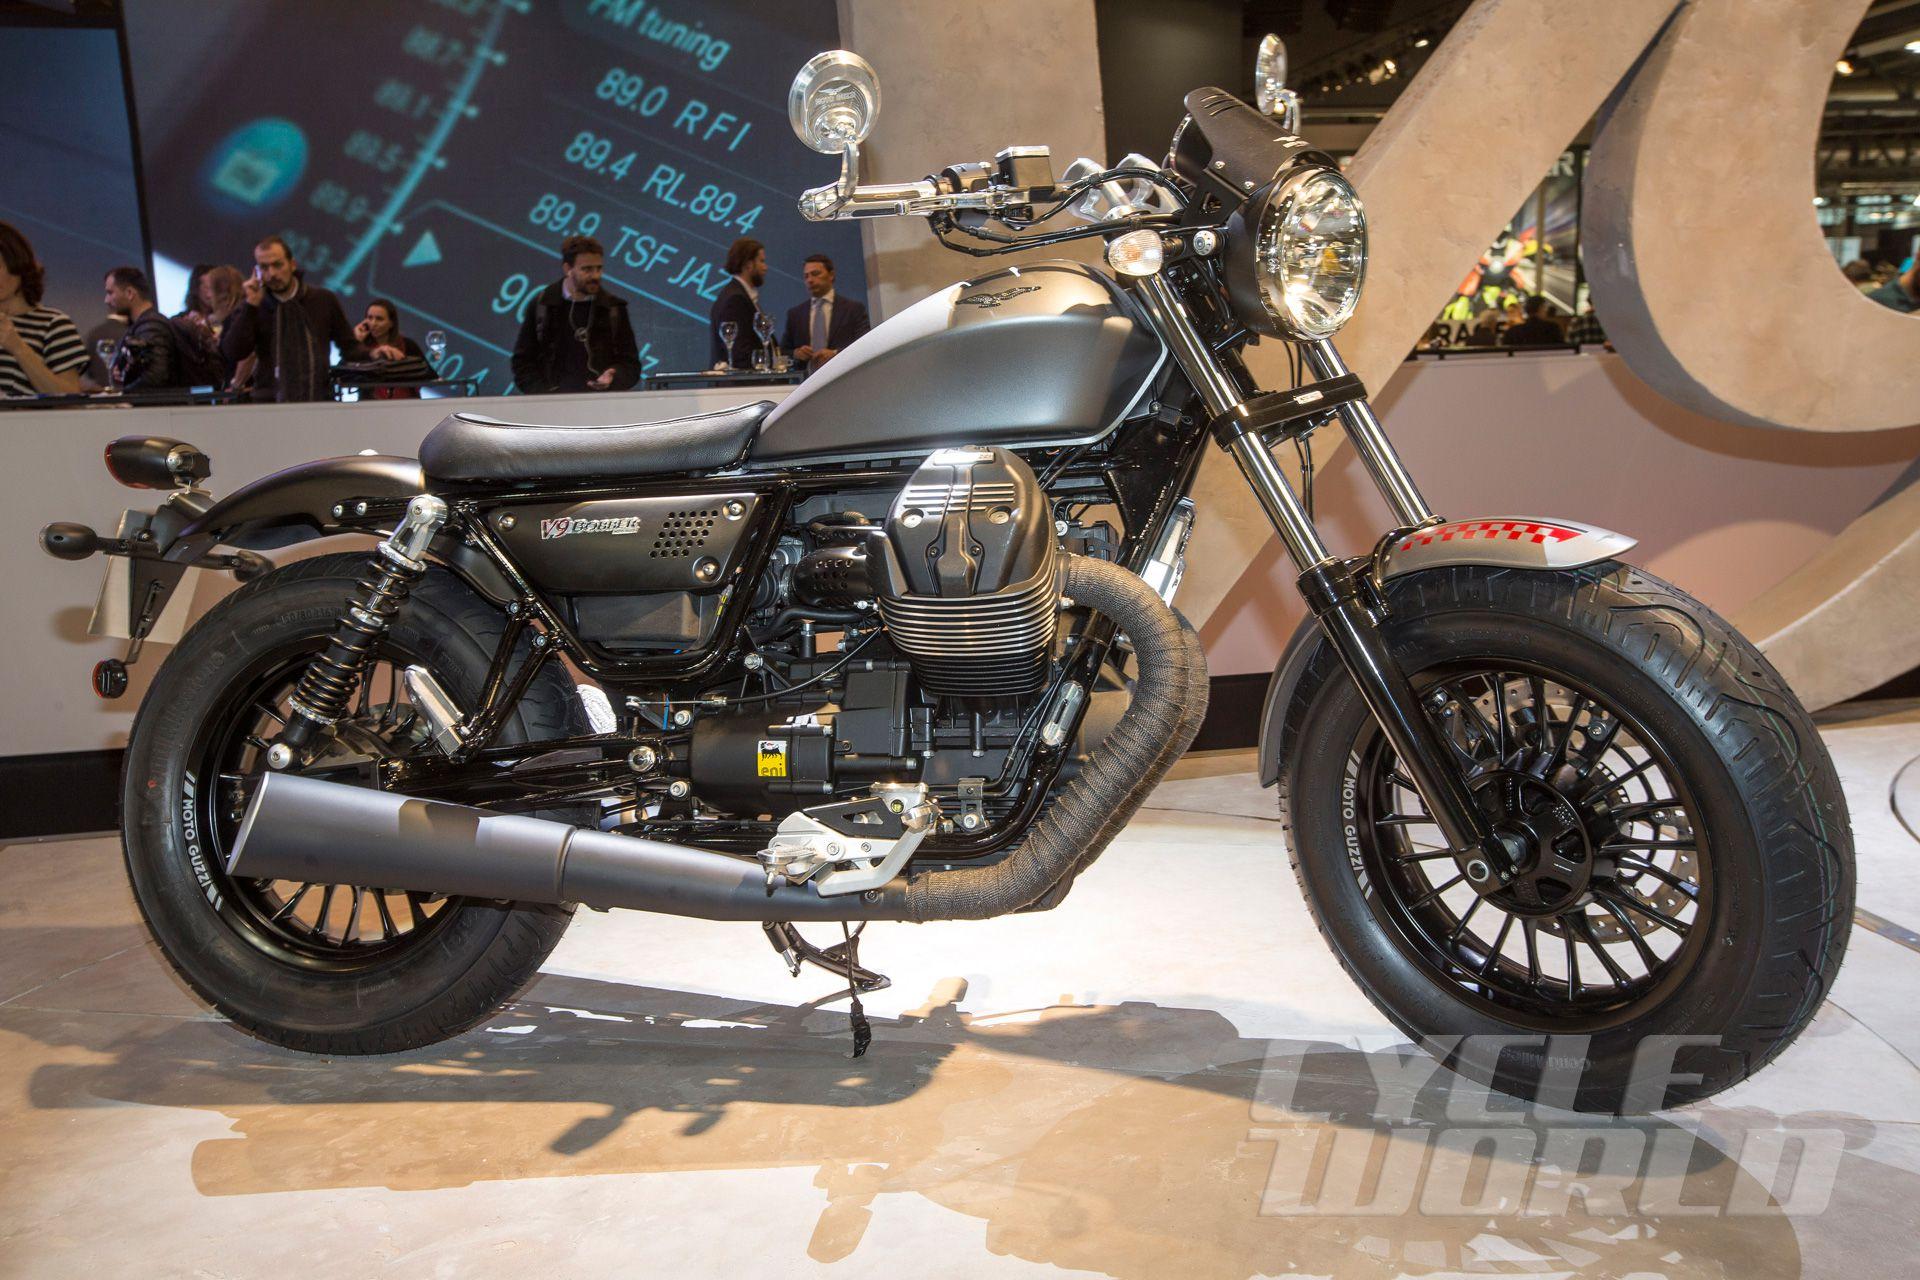 2016 Moto Guzzi V9 Roamer V9 Bobber Cruiser Review Photos Cycle World